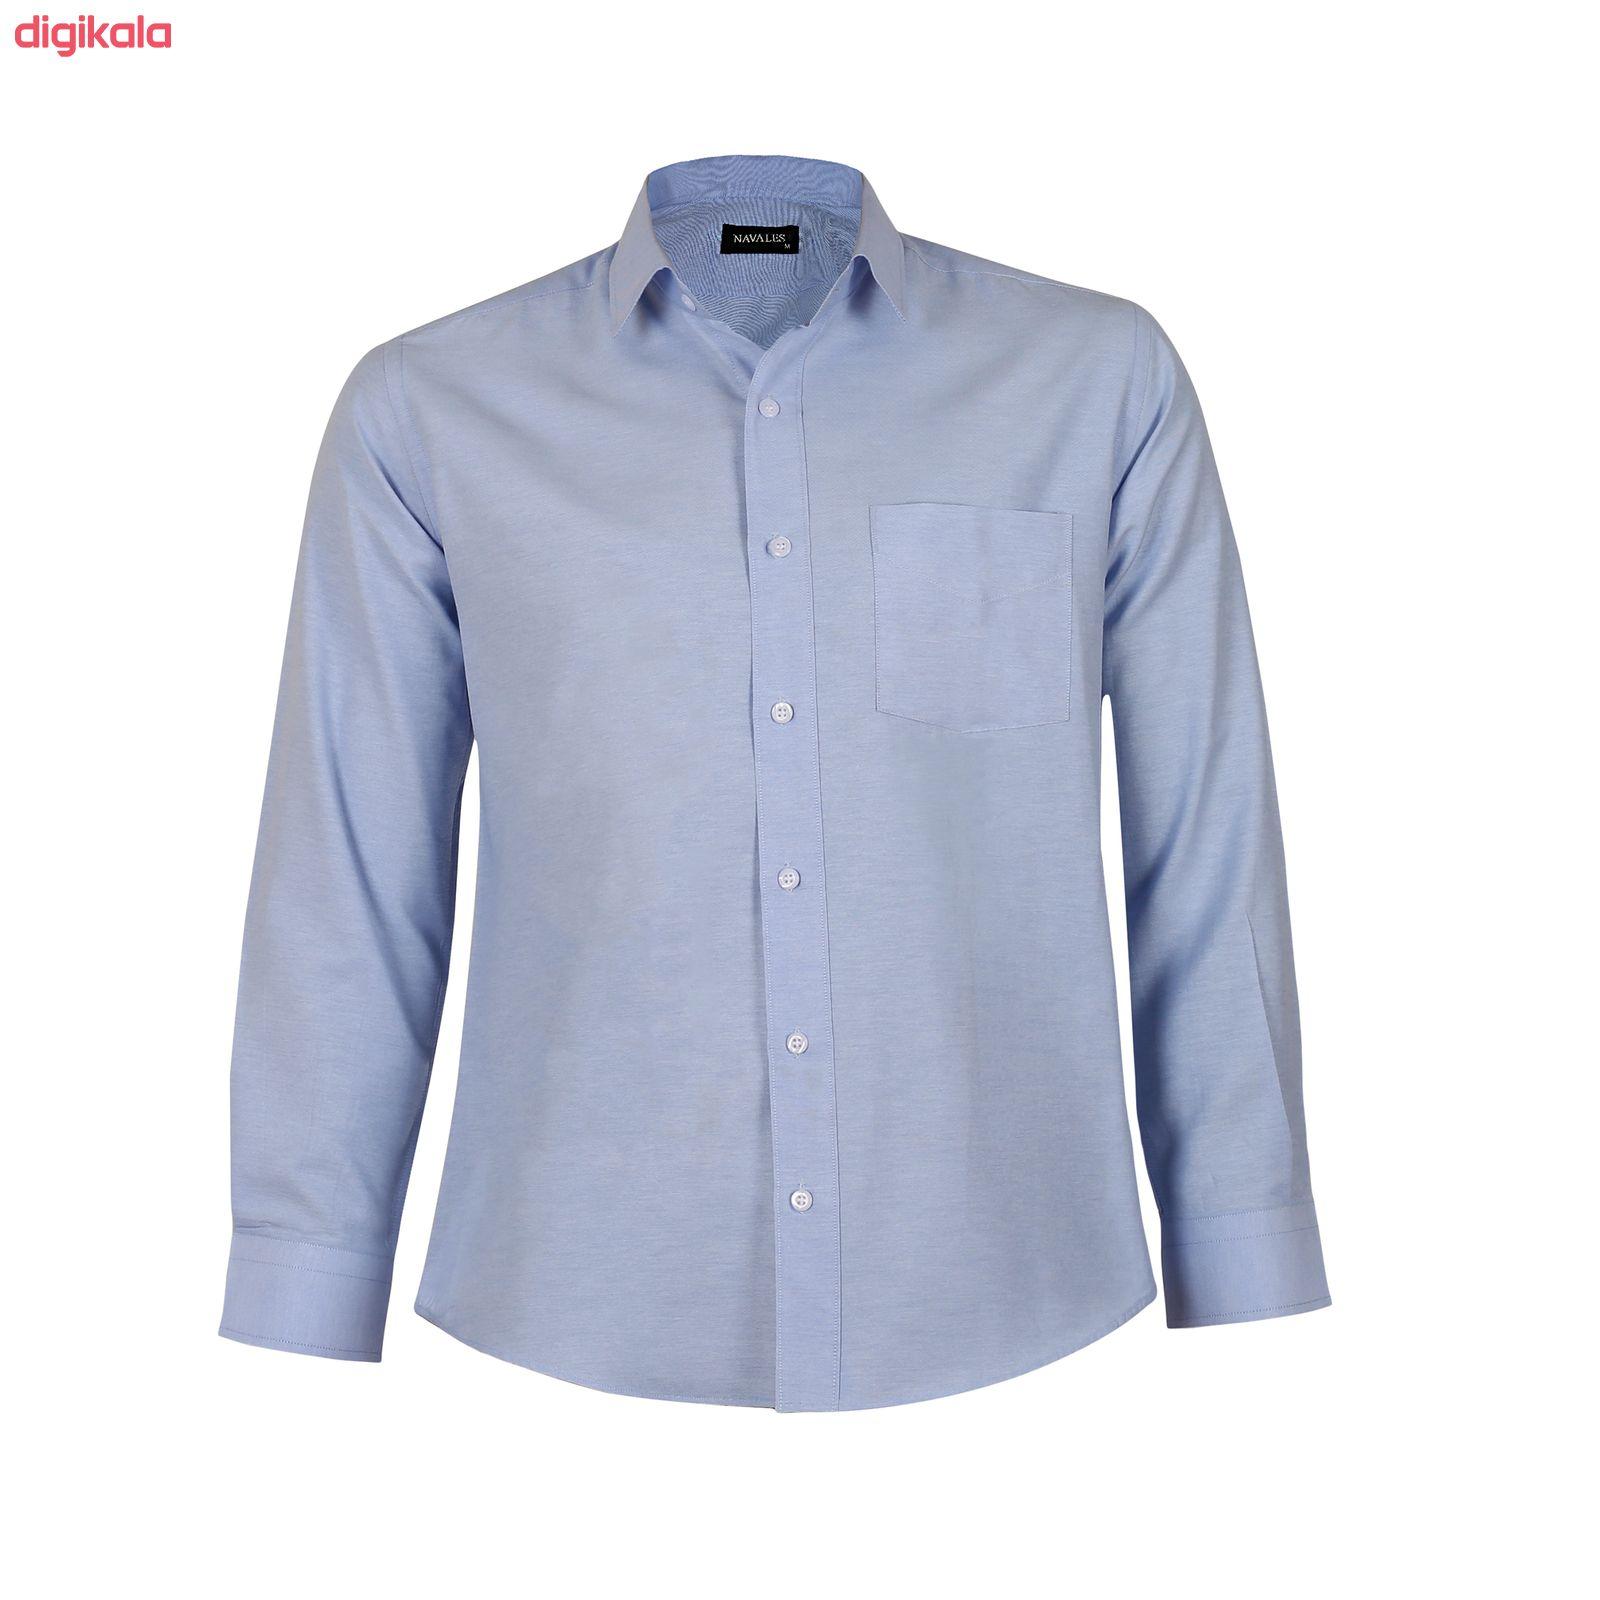 پیراهن آستین بلند مردانه ناوالس مدل NOx8020-BL main 1 3